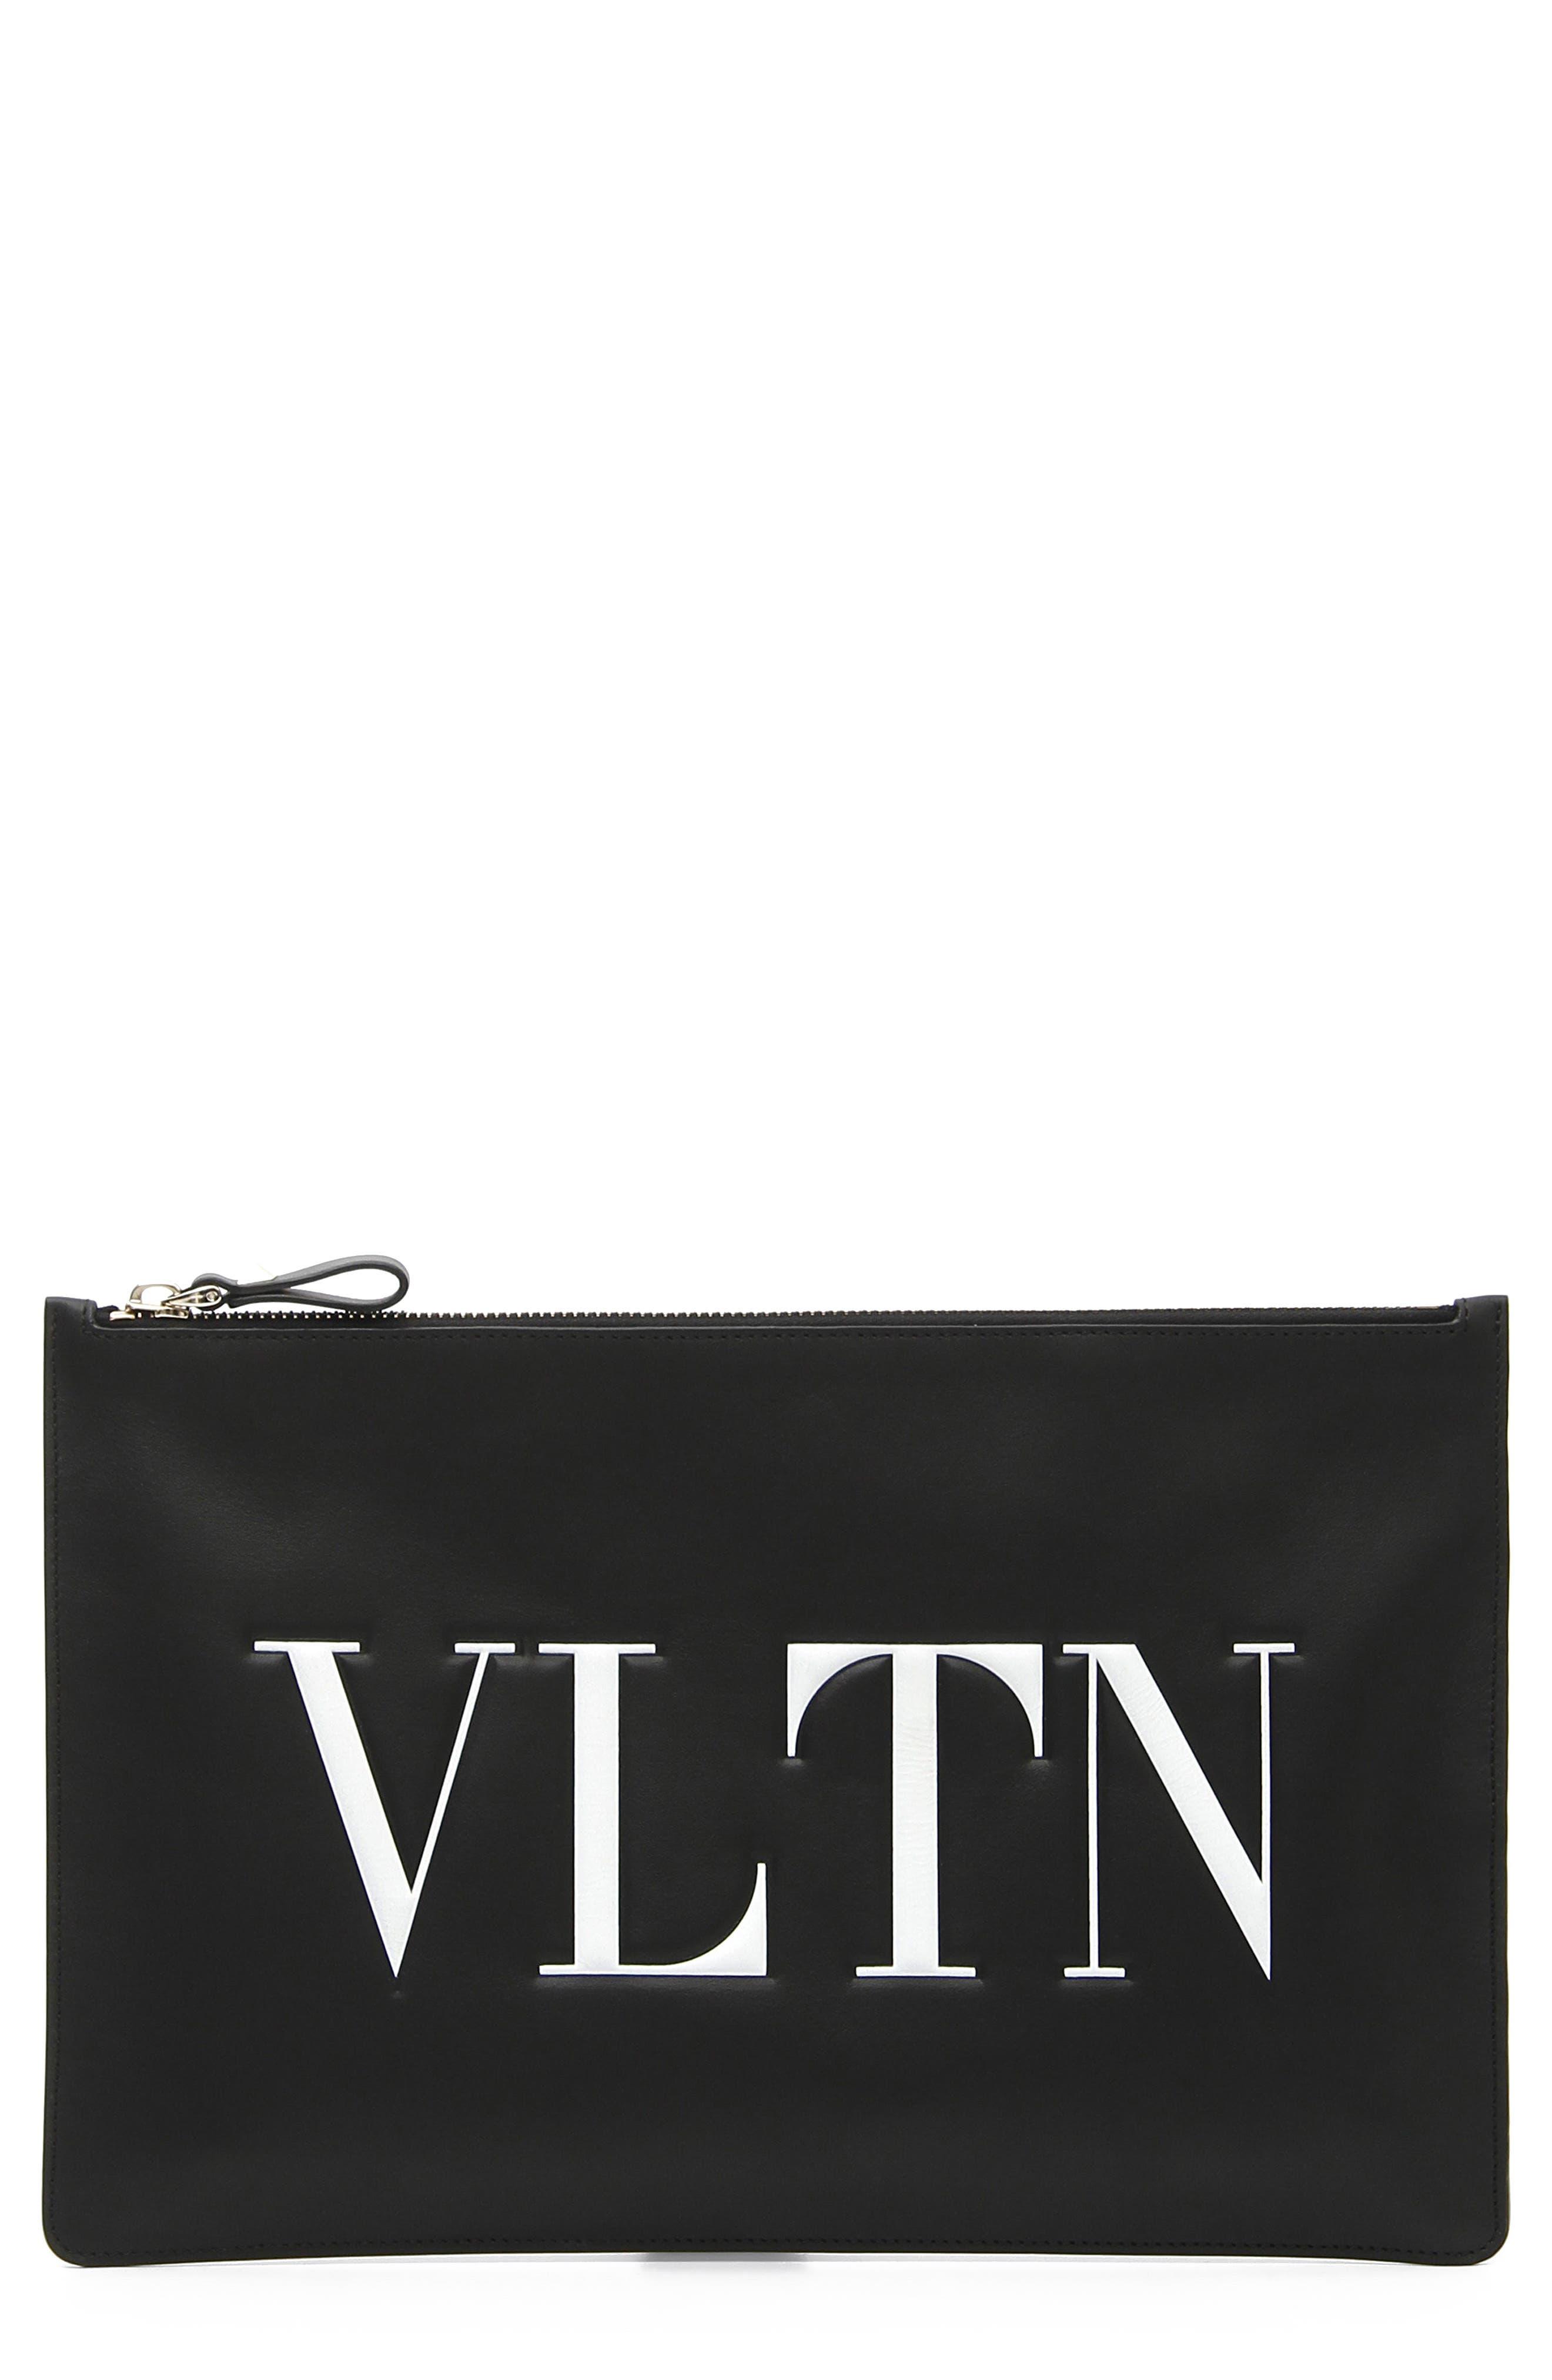 VALENTINO GARAVANI, Logo Graphic Flat Leather Pouch, Main thumbnail 1, color, NERO/ BIANCO